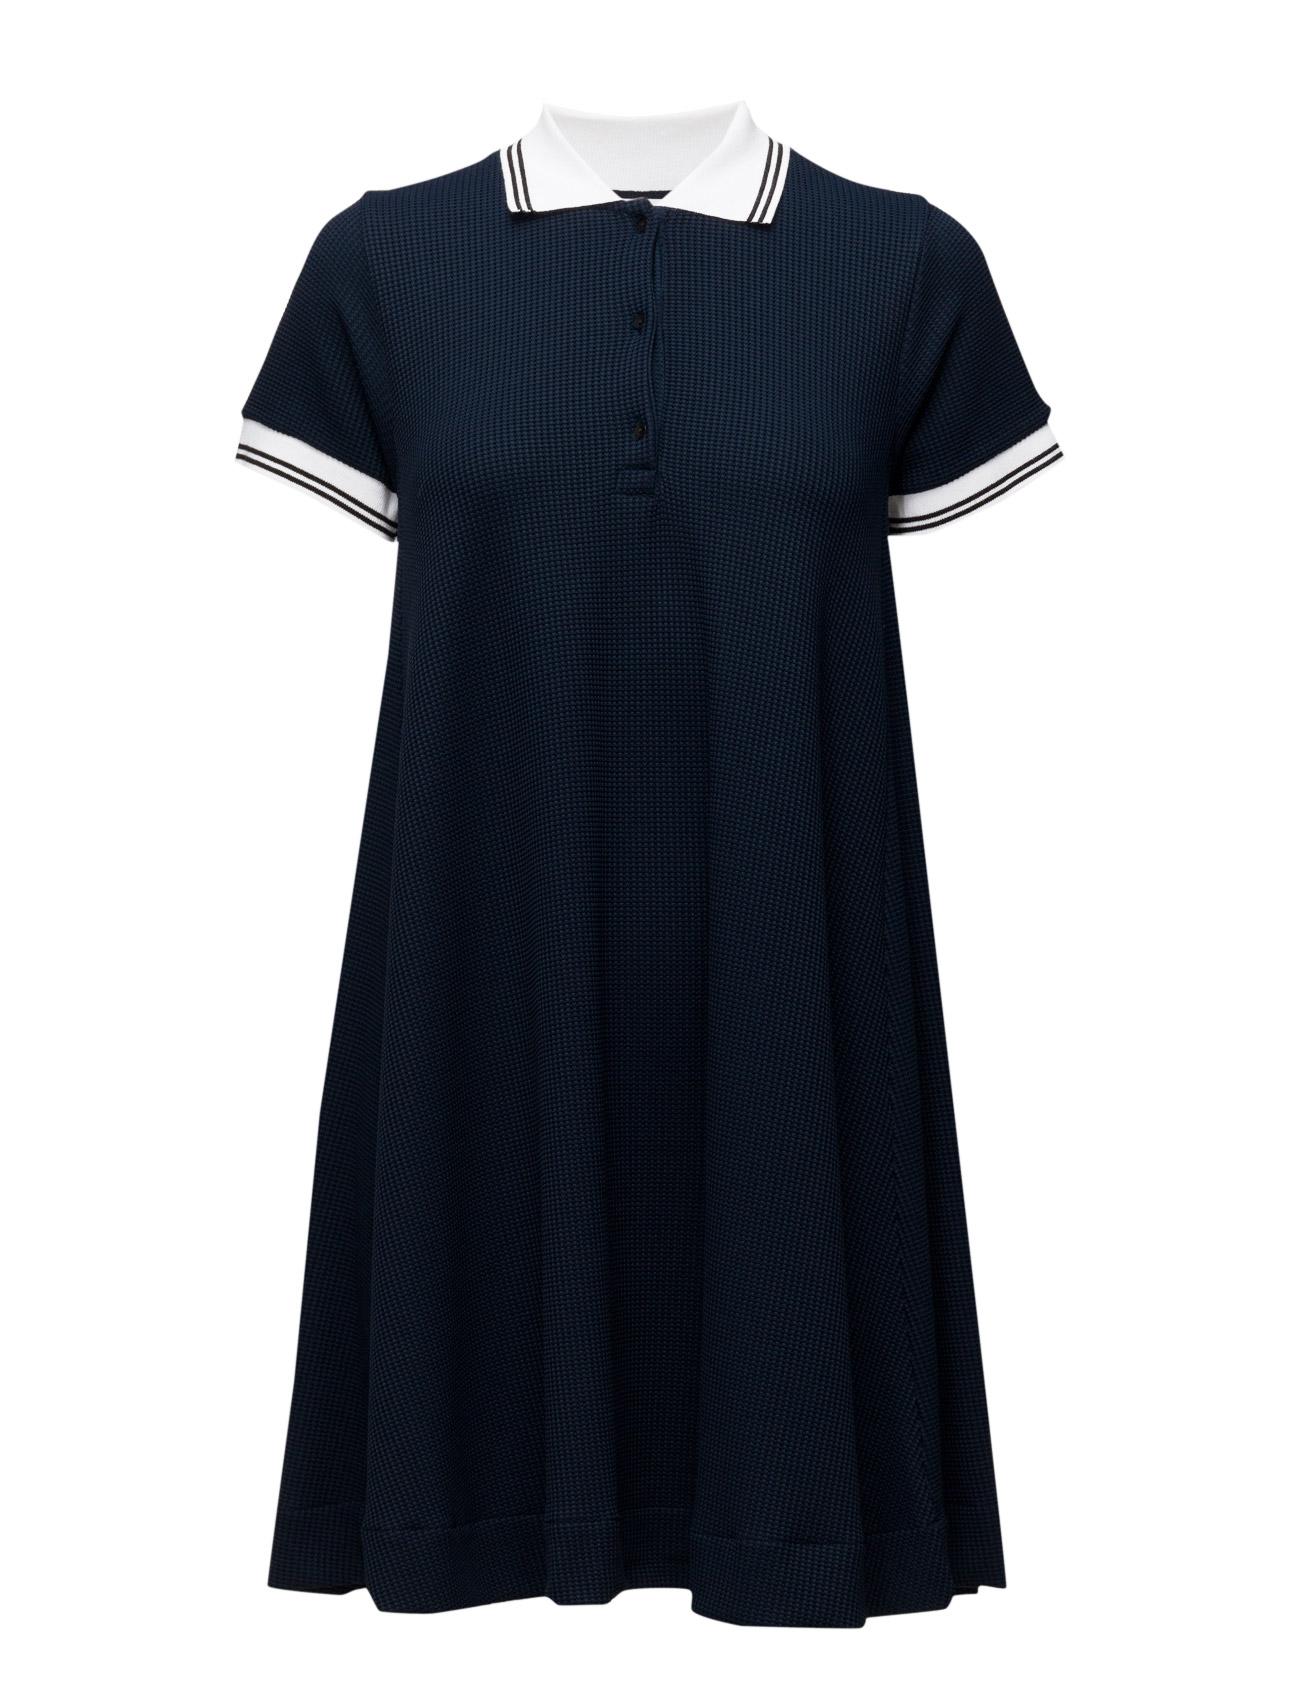 2nd Polaris 2NDDAY Korte kjoler til Kvinder i hvid